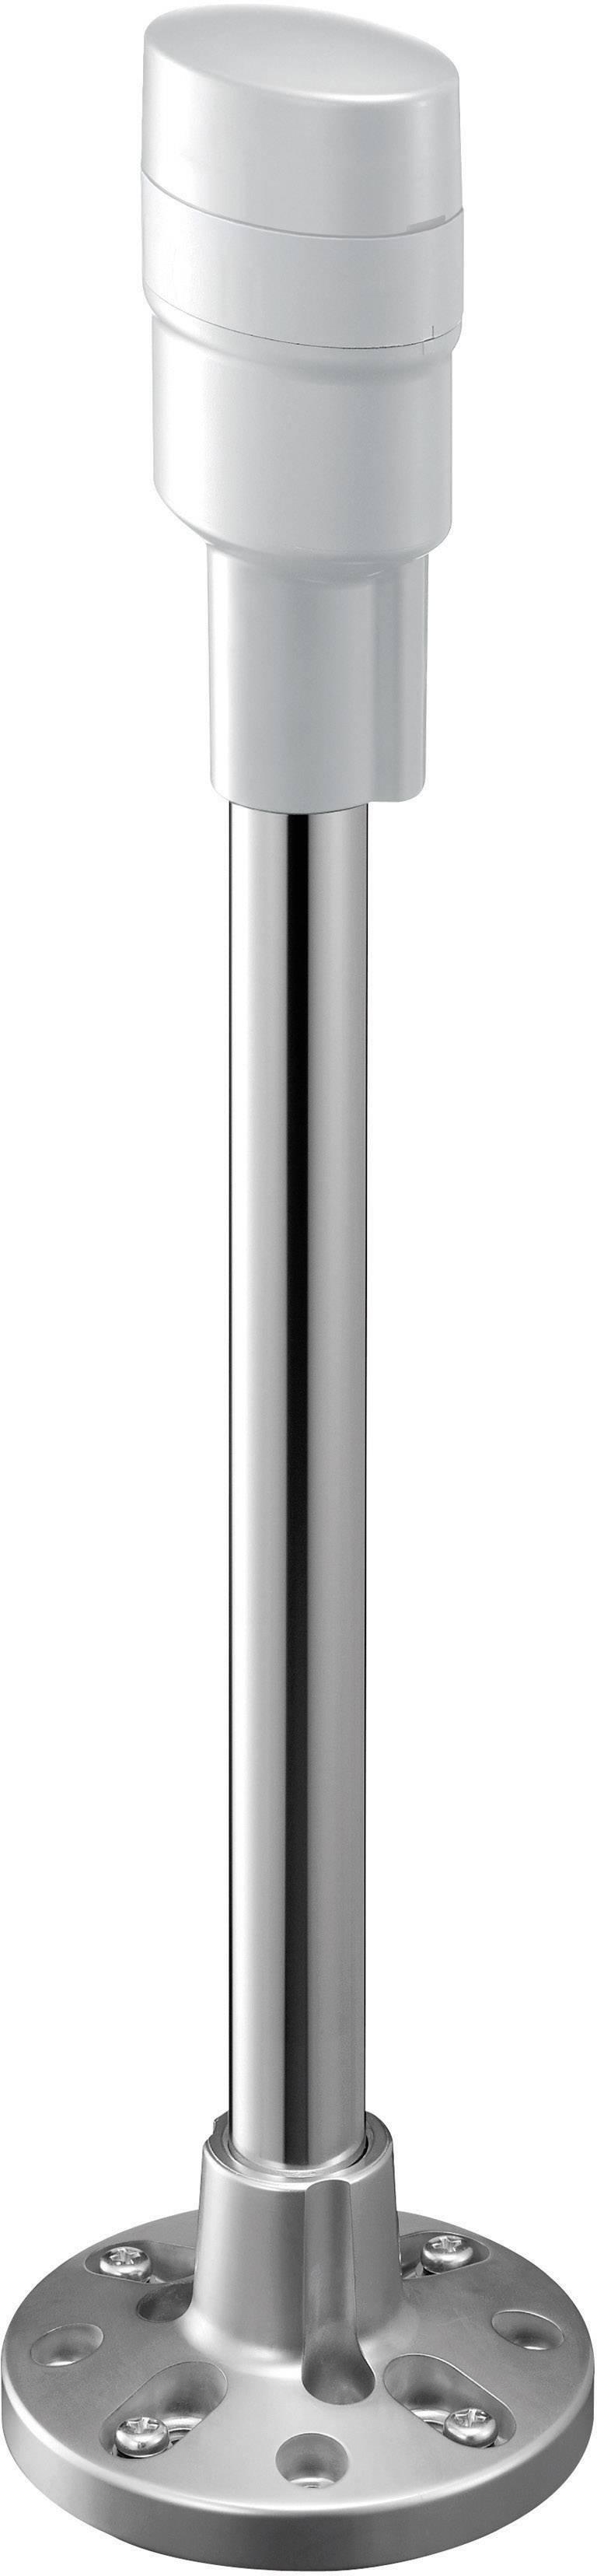 Signální modul, sada Idec LD6A-0PQW